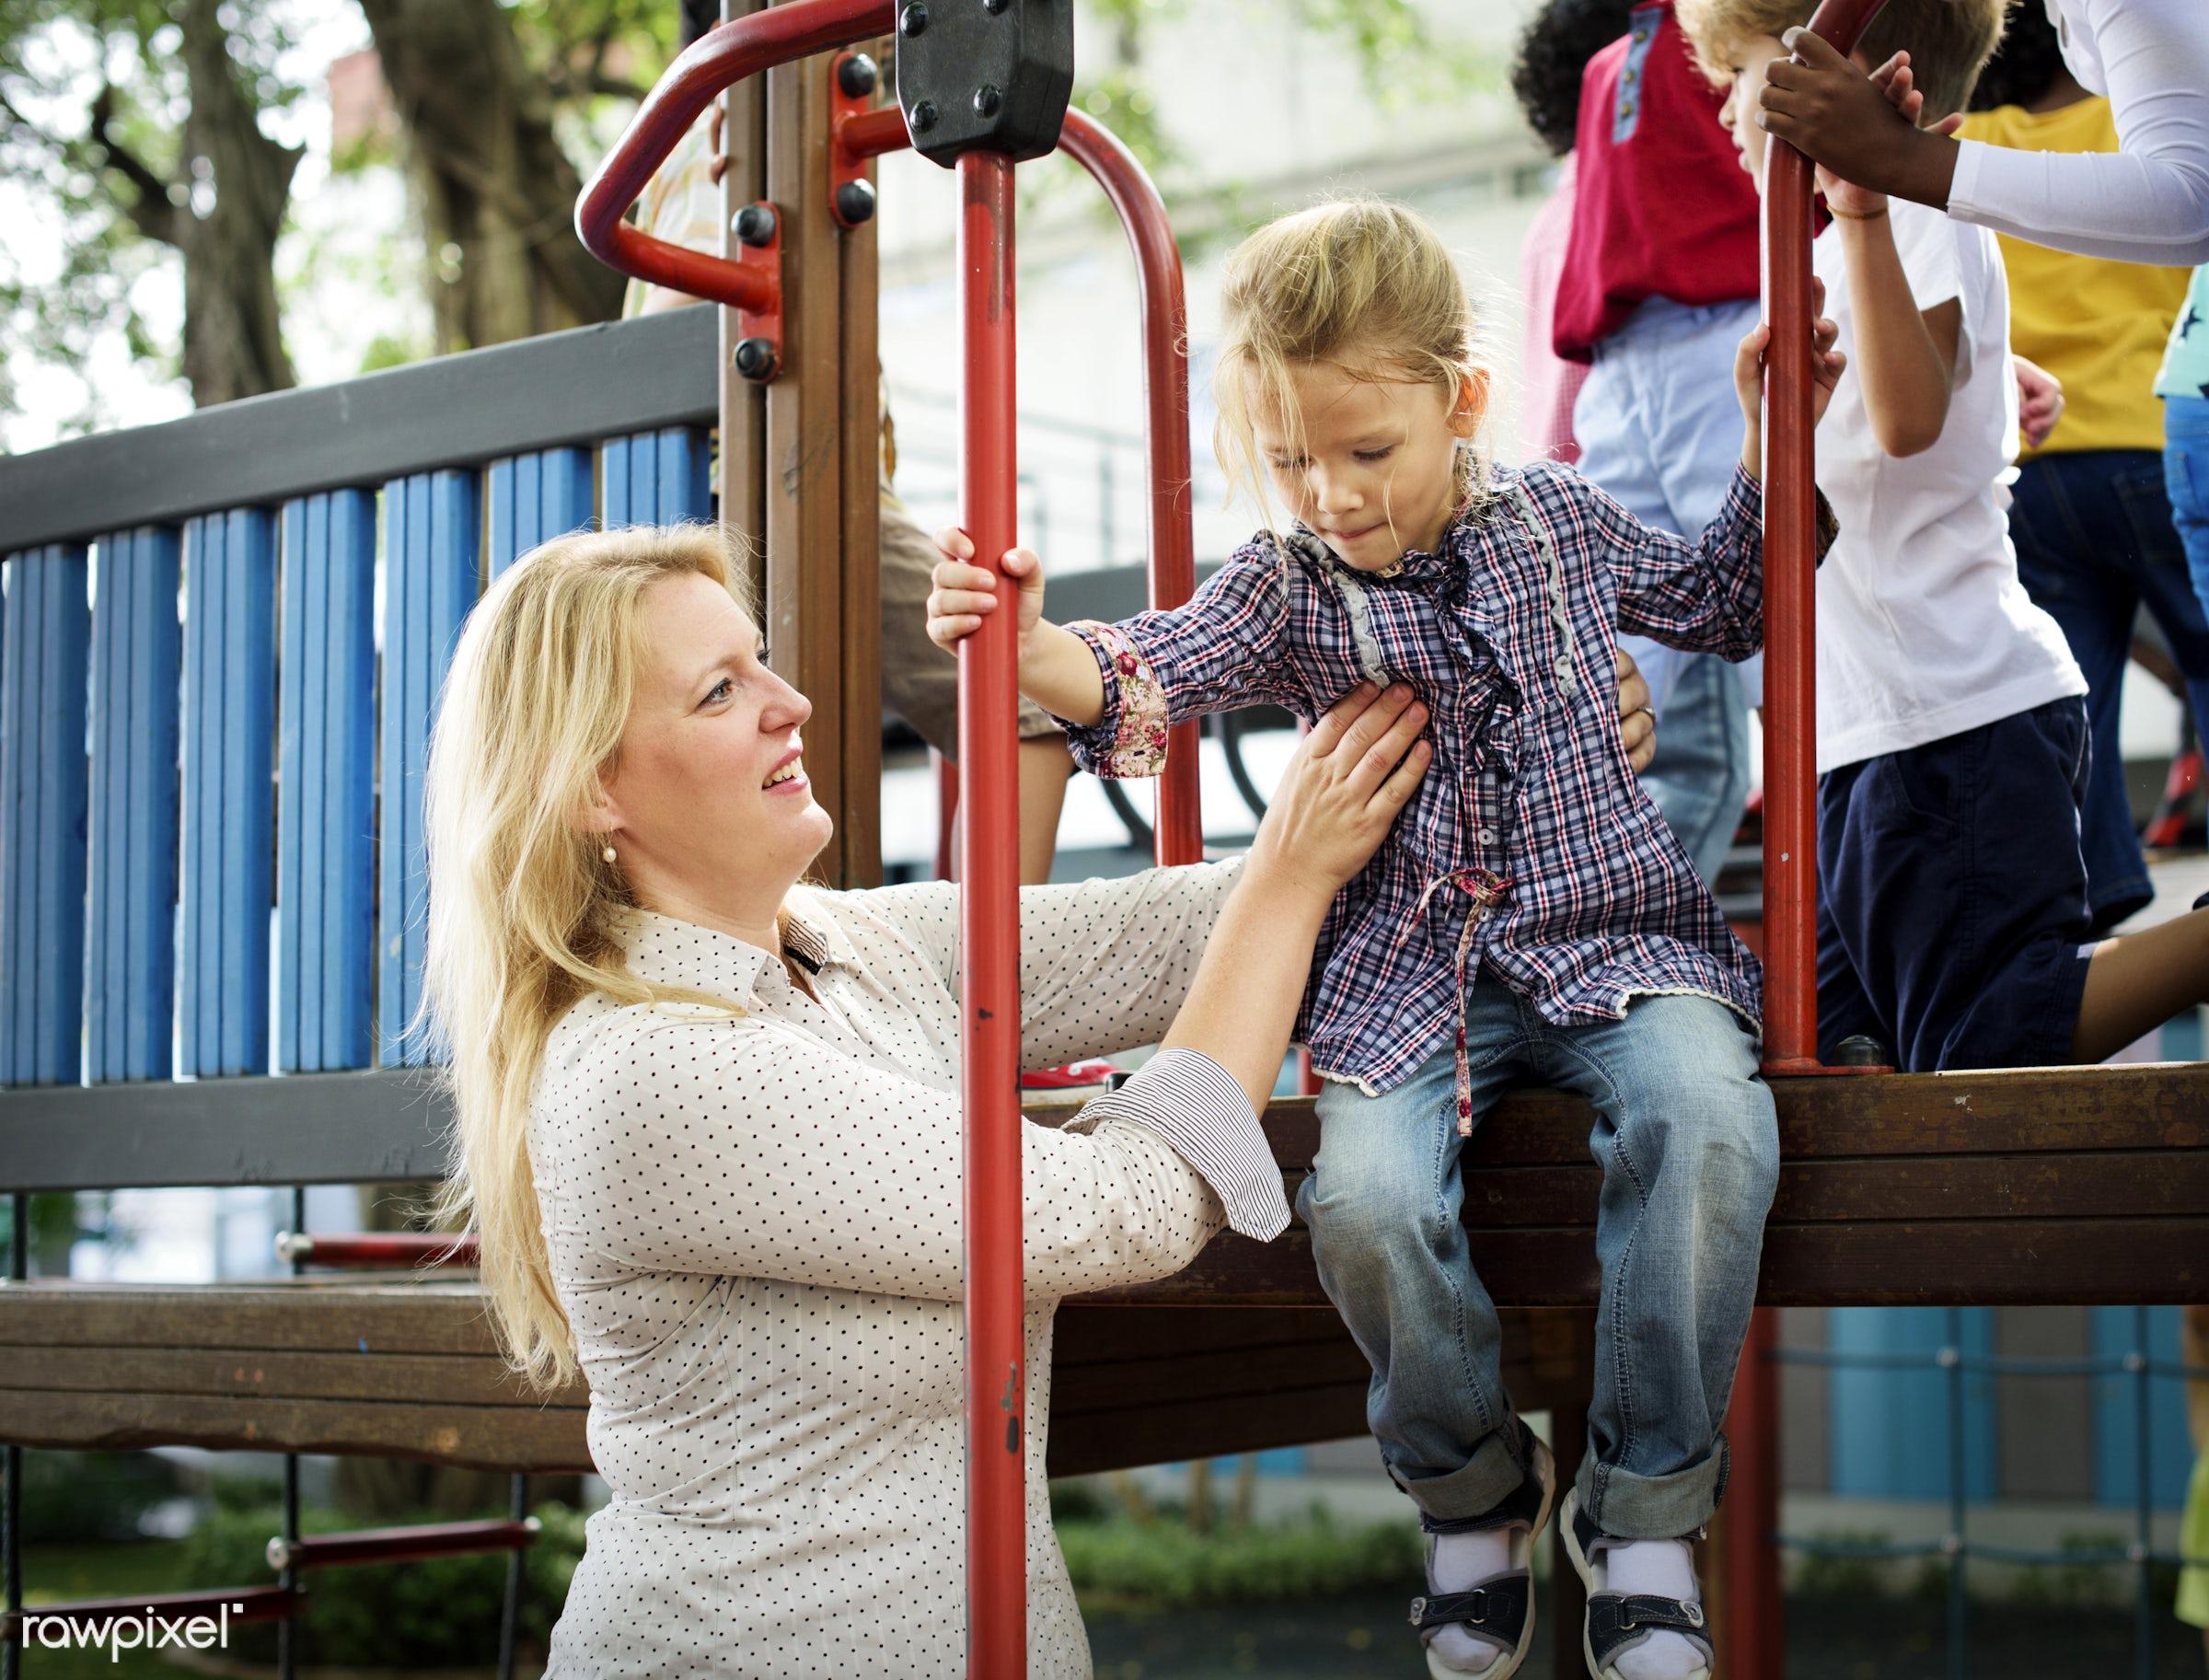 Happy kids at elementary school - getting, recreation, kid, child, playing, care, cheerful, preschool, girls, playground,...